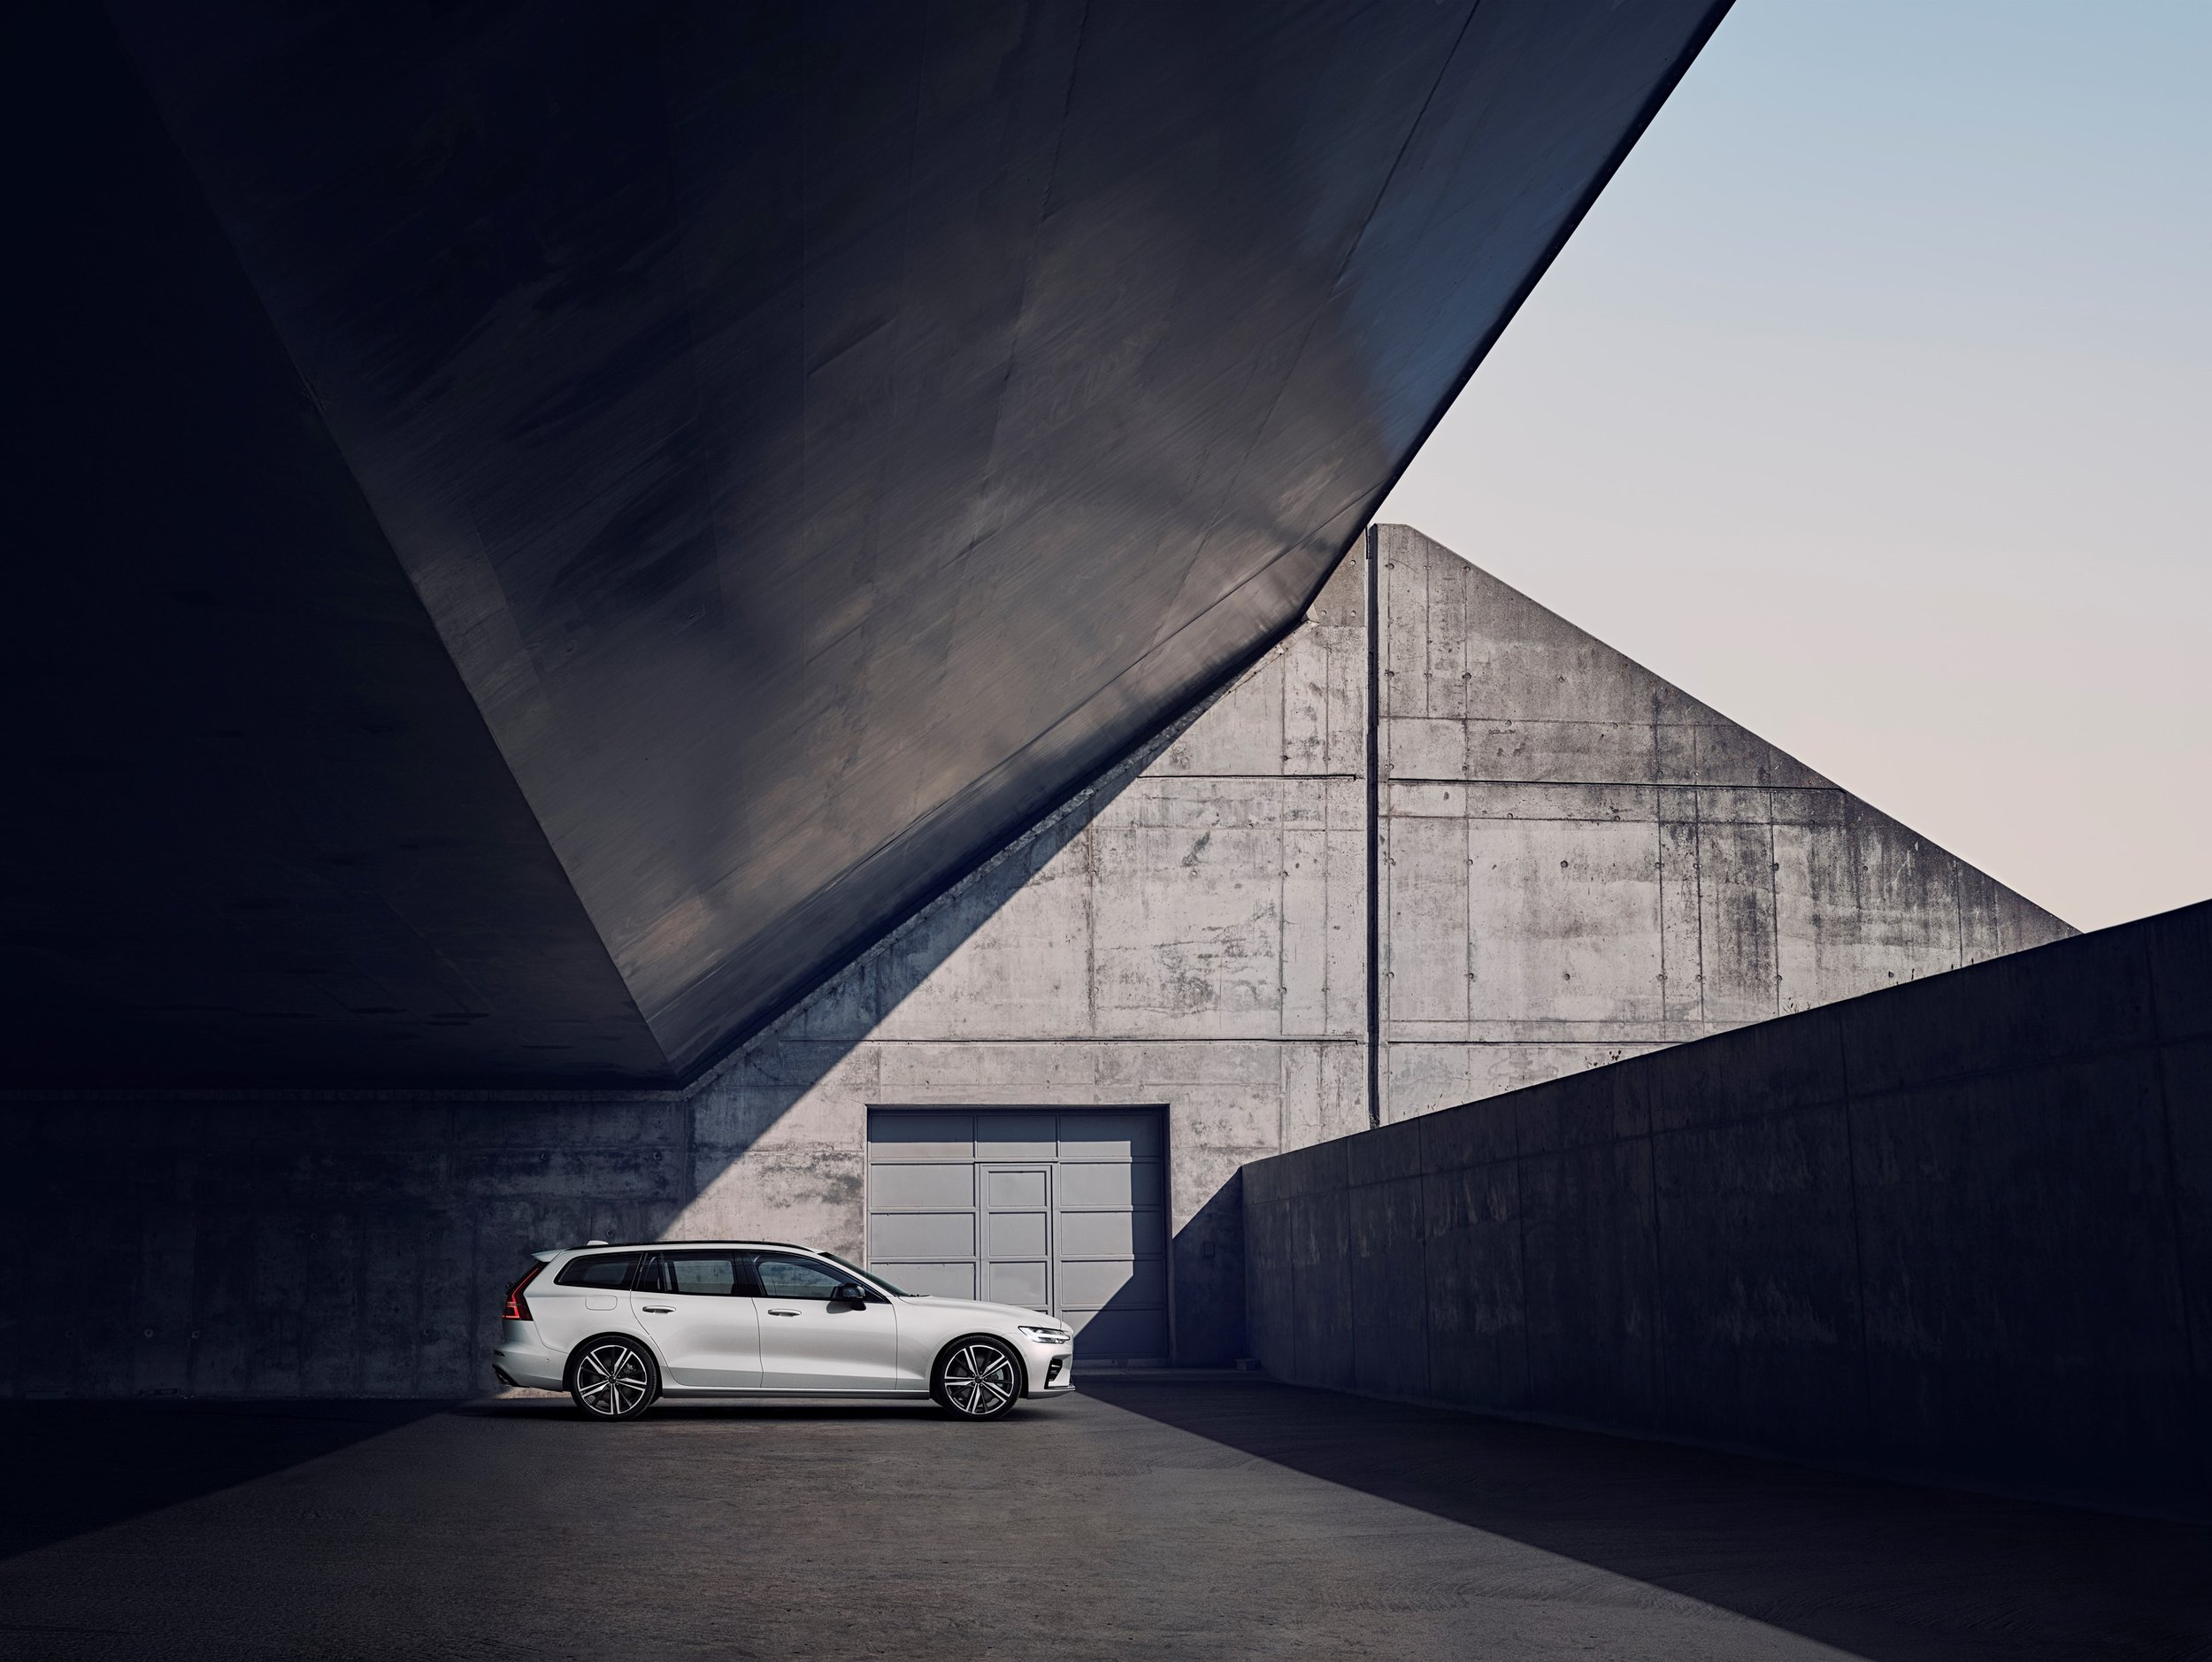 231022_Volvo_V60_R-Design.jpg